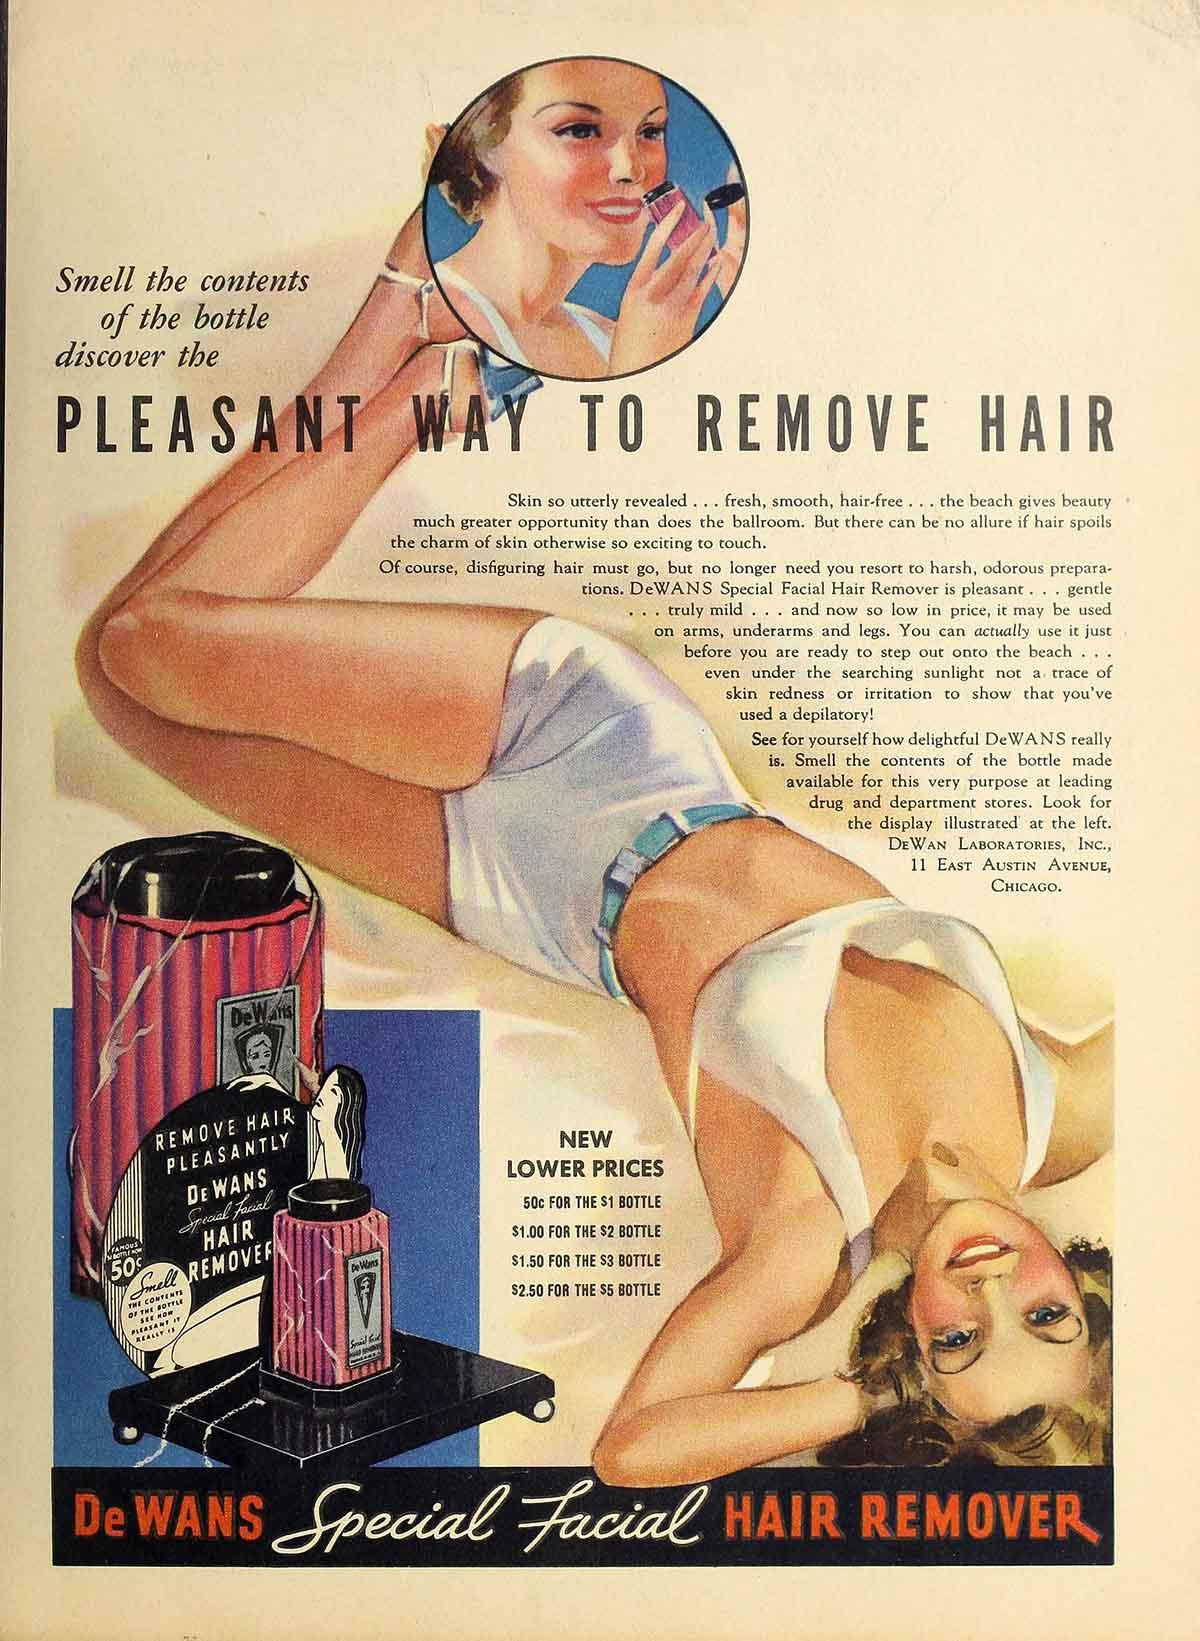 Hollywood-Beach-Body---Hair-Removal-advert-1934